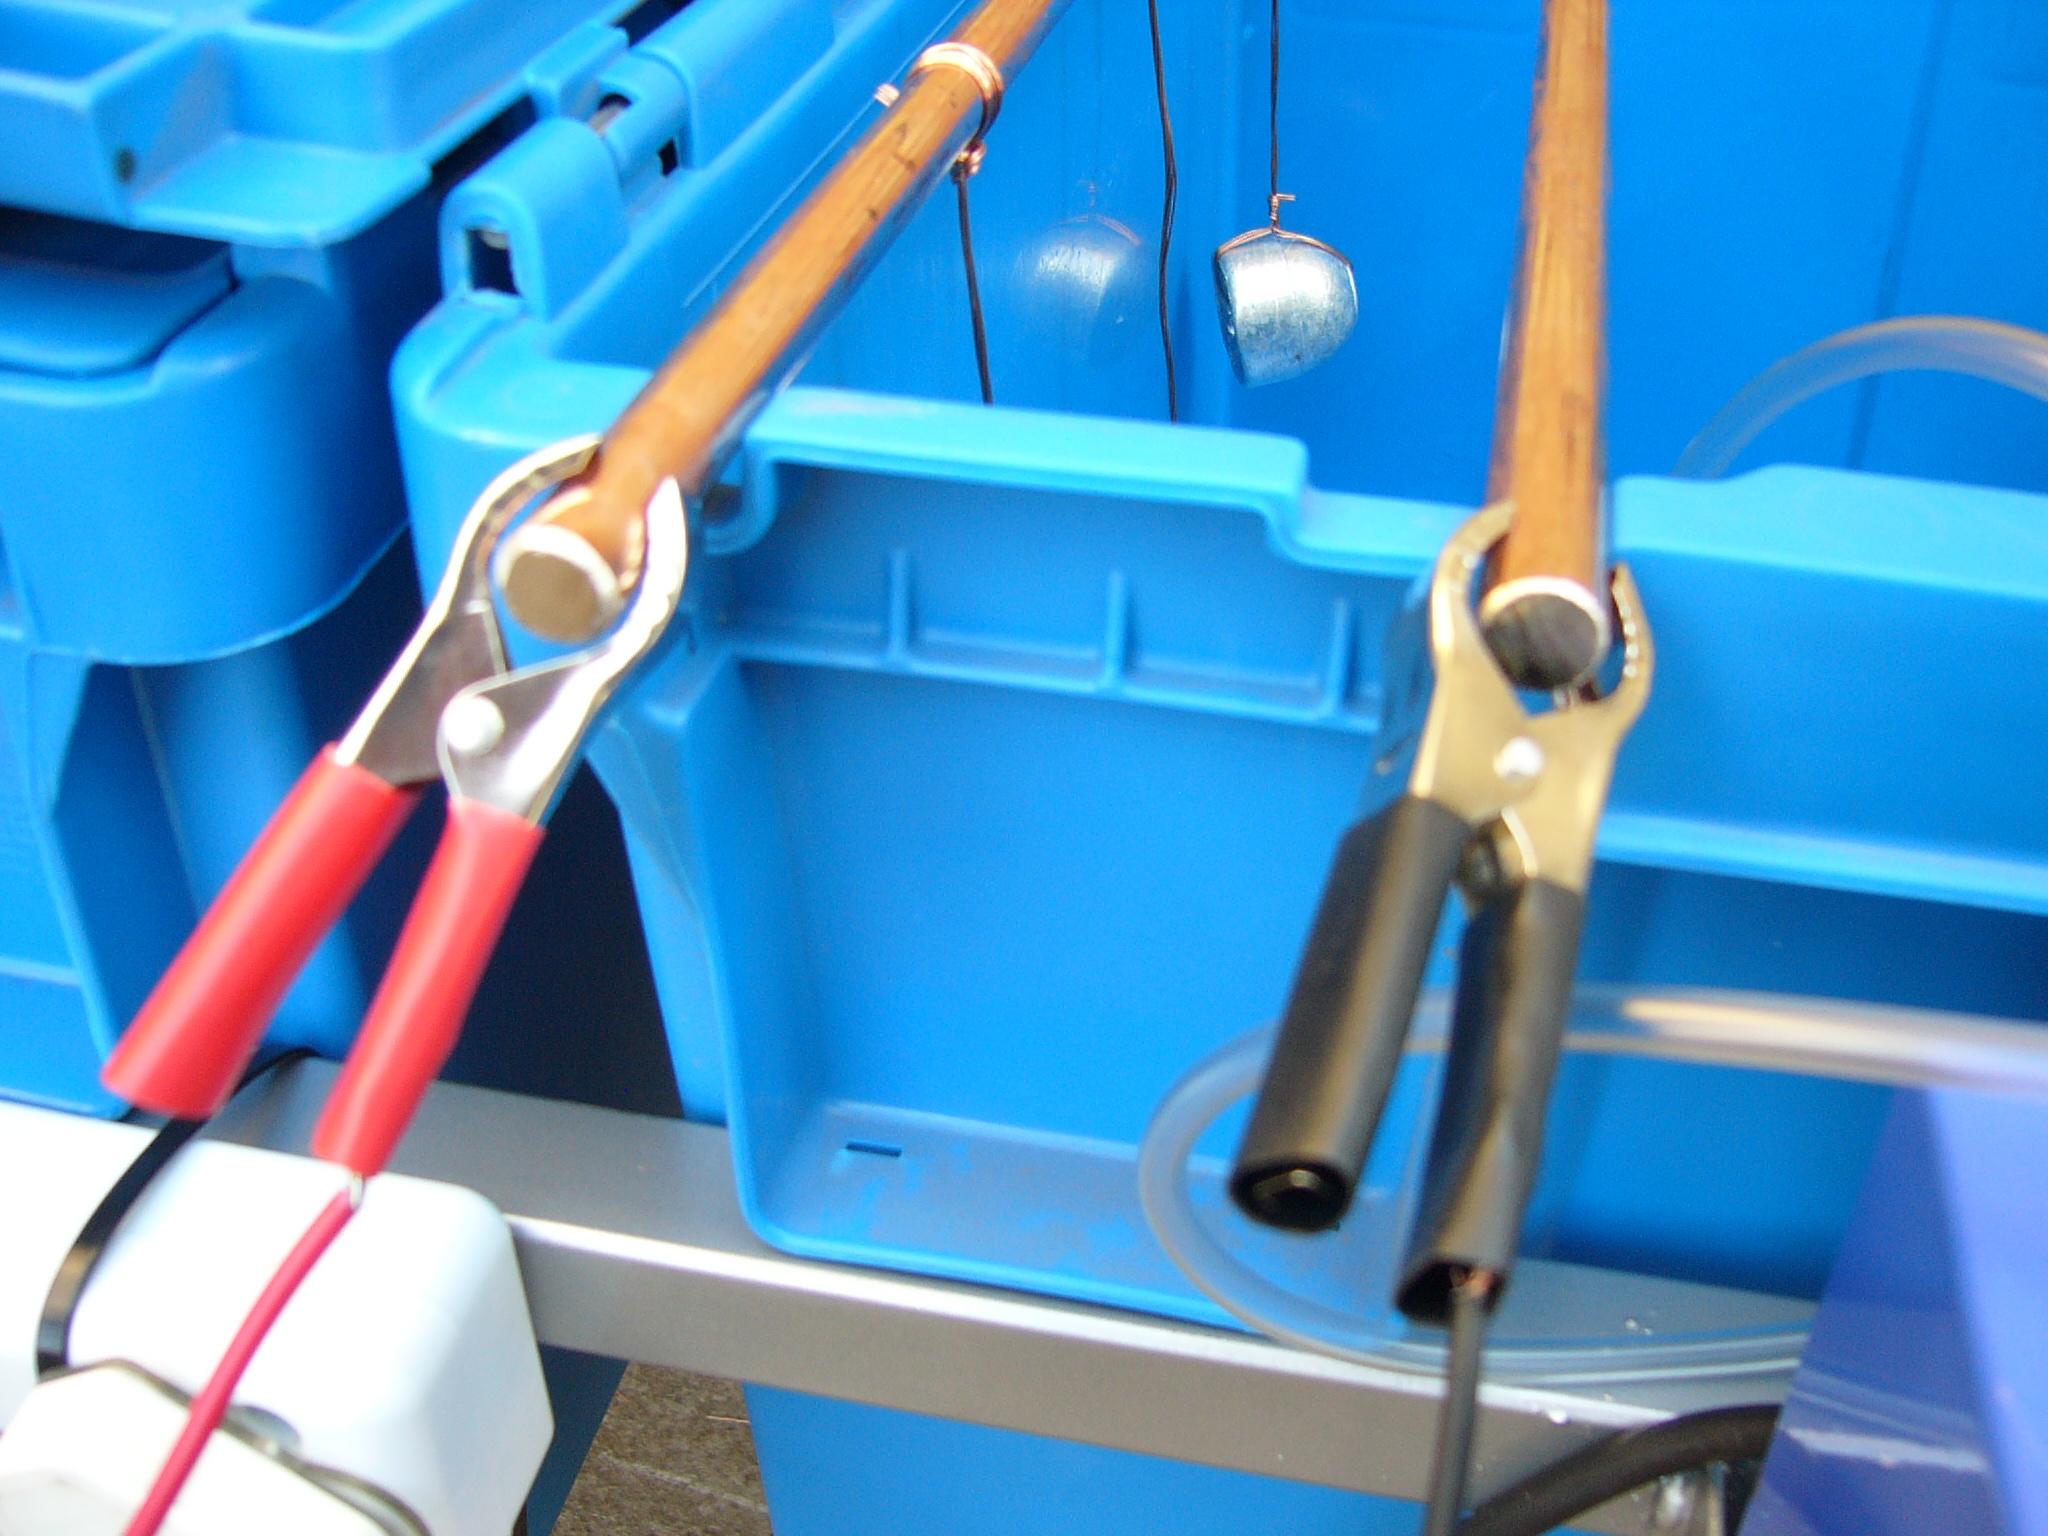 Diy chrome plating kit south africa diy projects ideas diy chrome kit south africa clublilobal com e book a z of electroplating solutioingenieria Gallery